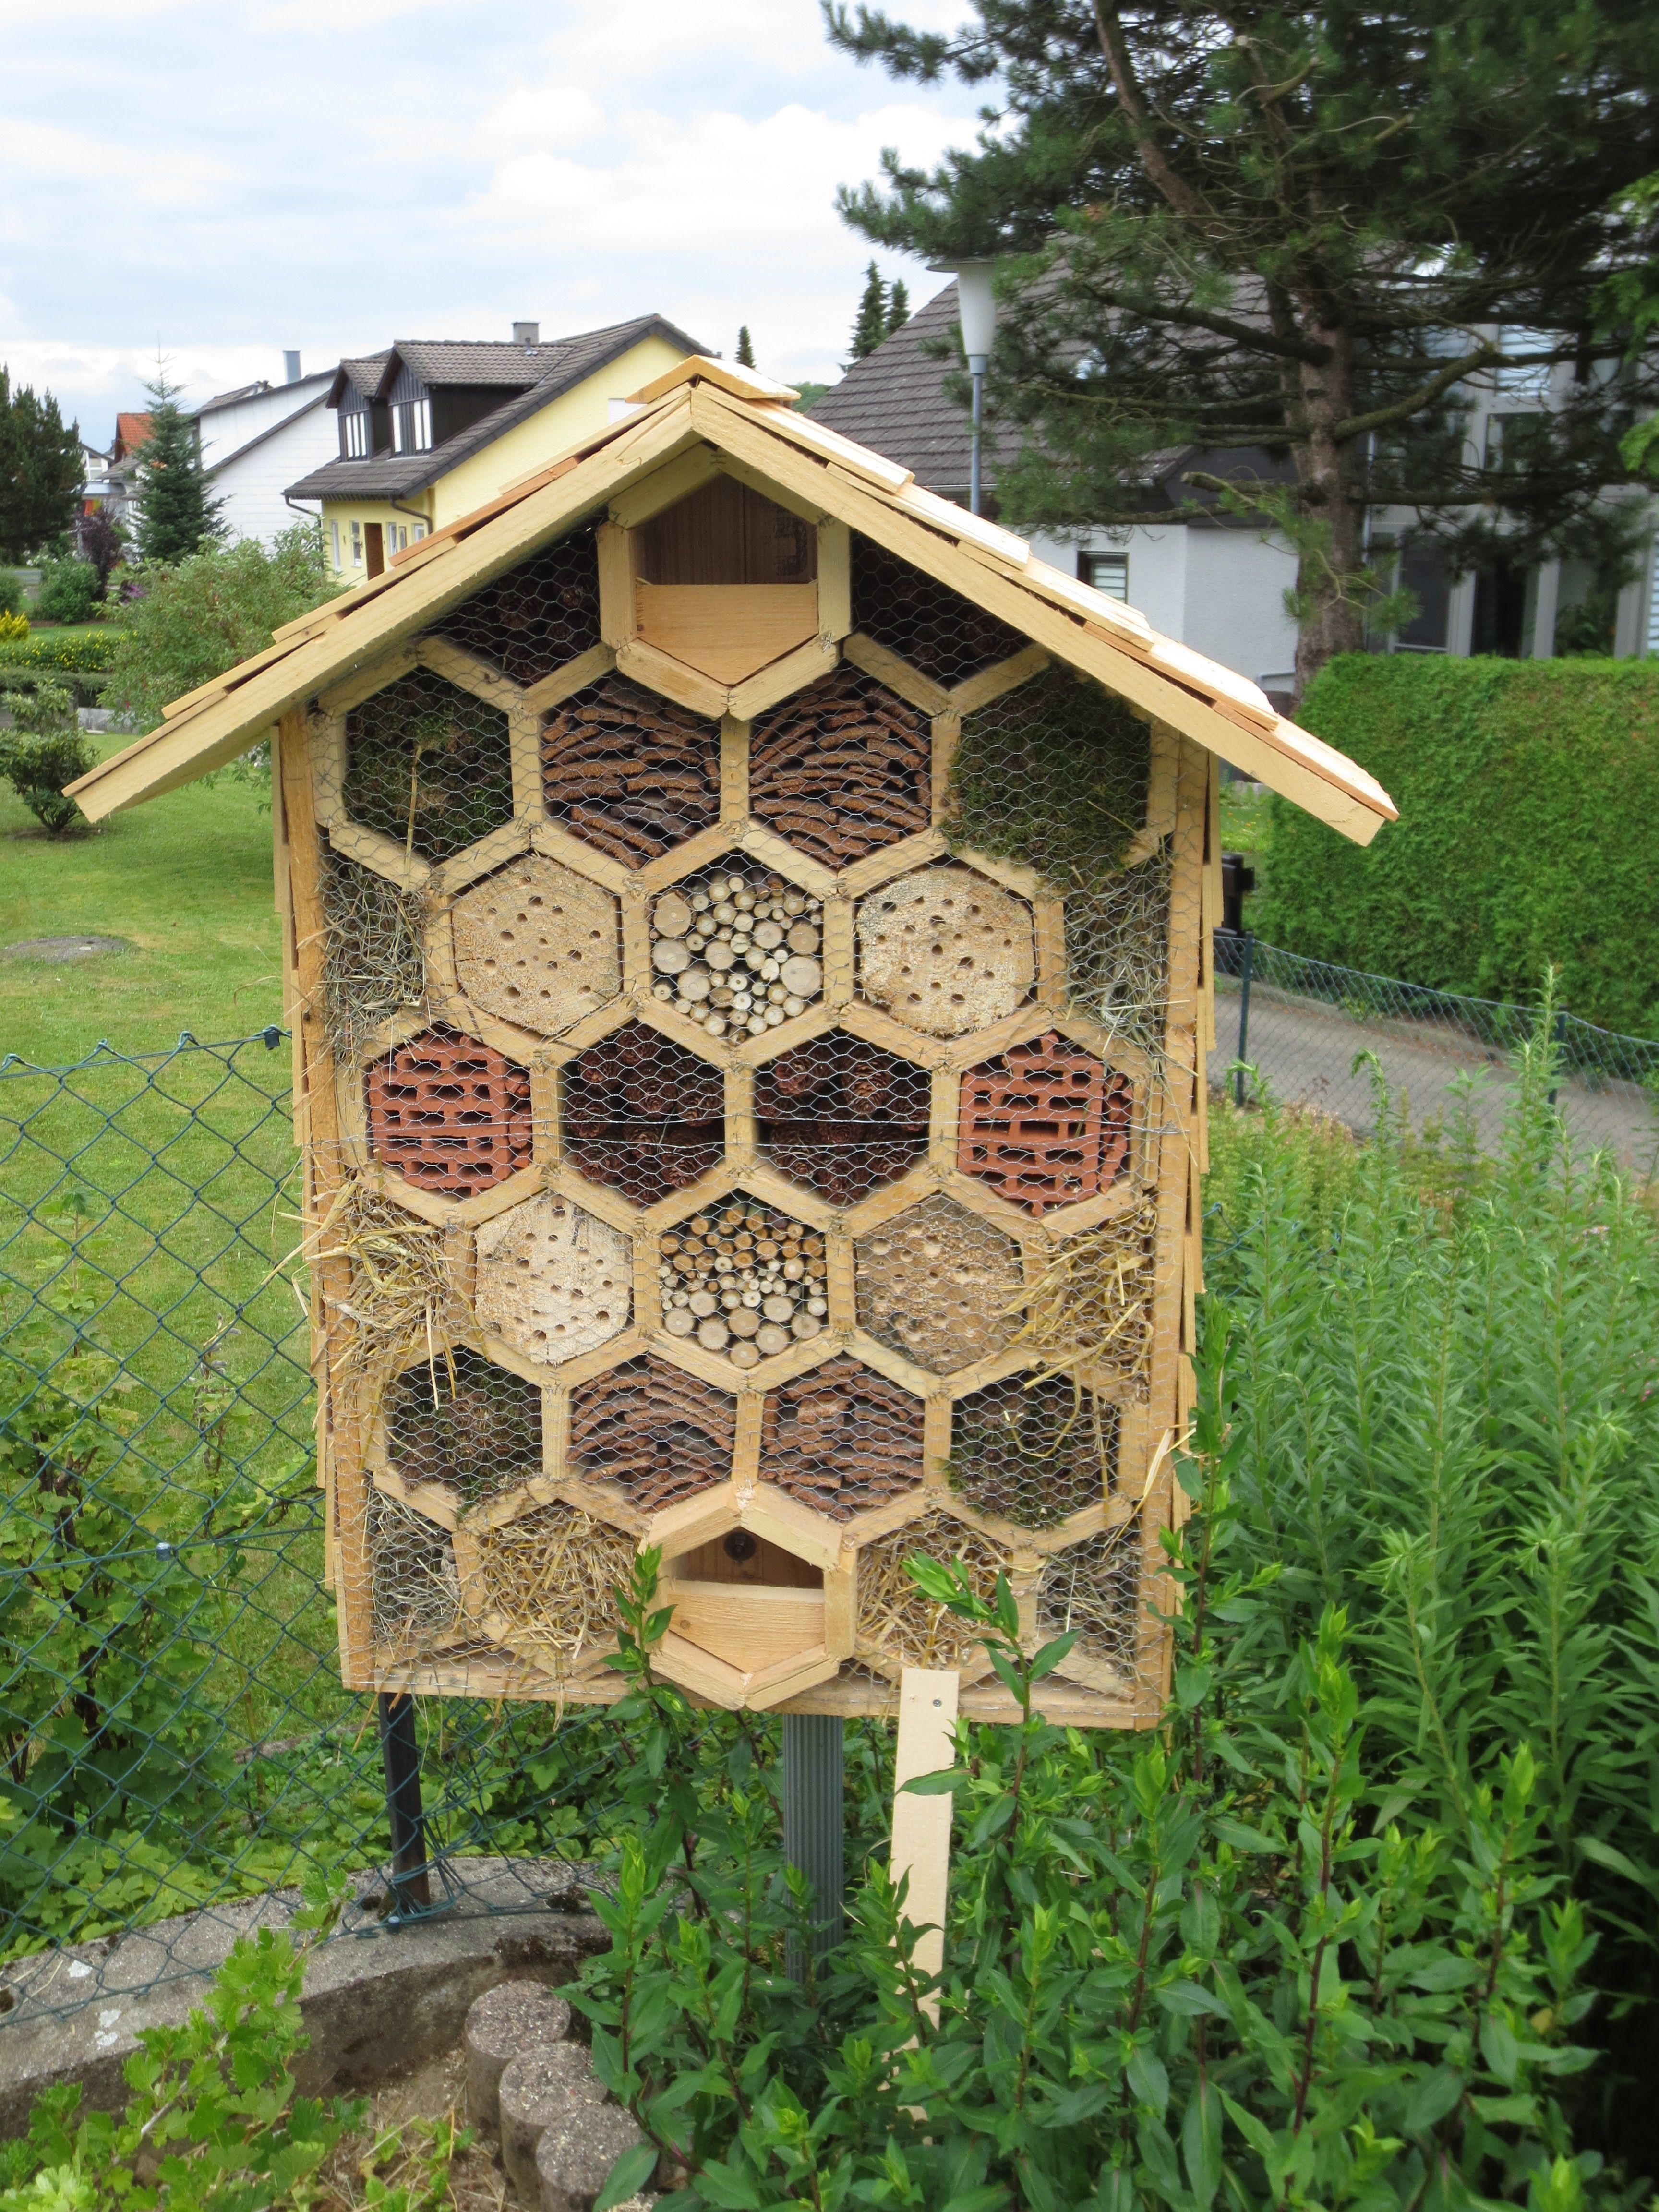 vier sterne insektenhotel bauanleitung zum selber bauen. Black Bedroom Furniture Sets. Home Design Ideas